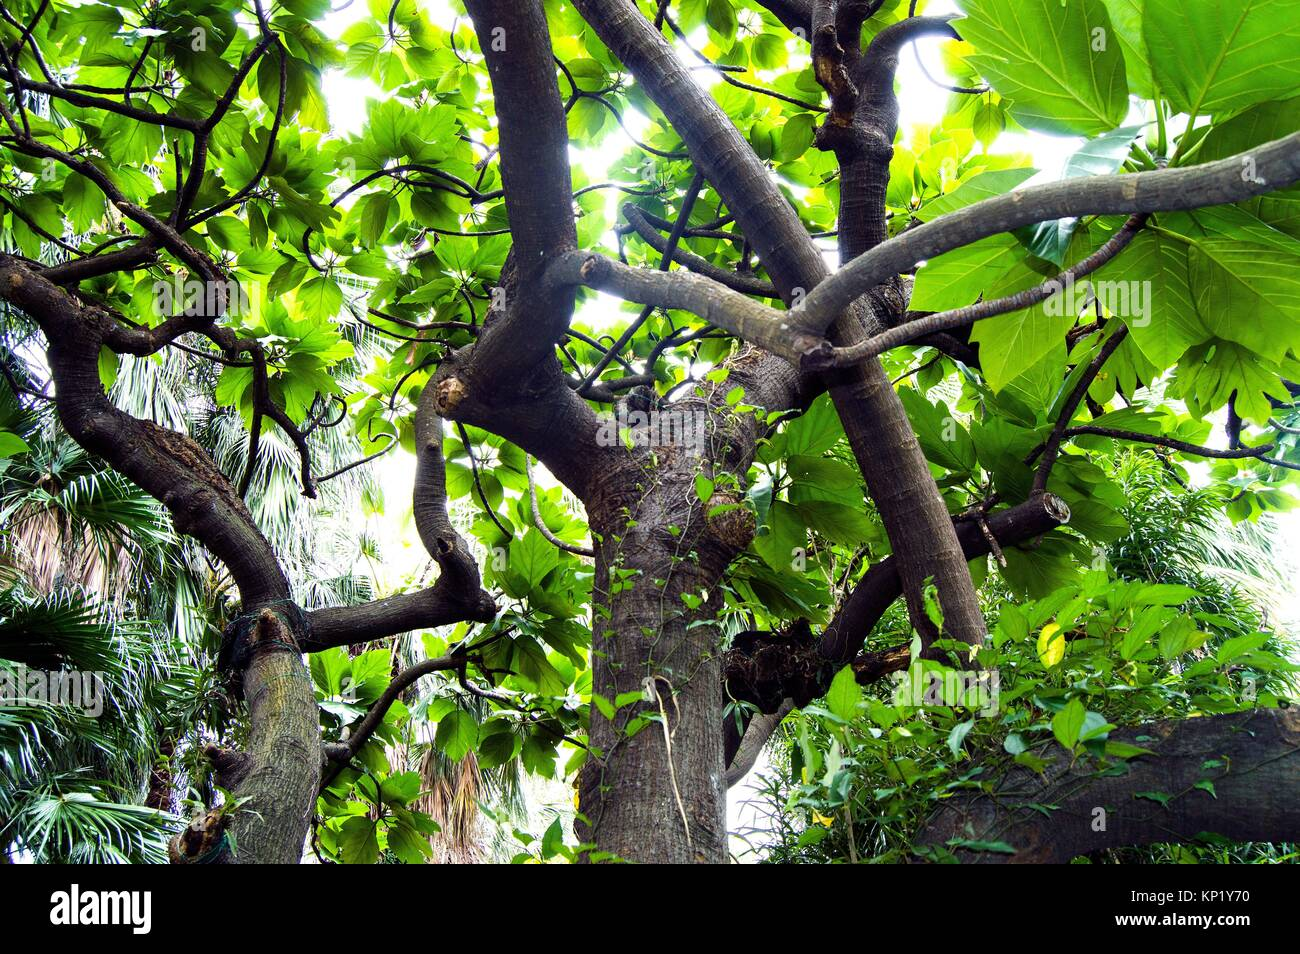 Polypodiaceae tree, botanical gardens, Wanhua, Taipei, Taiwan - Stock Image